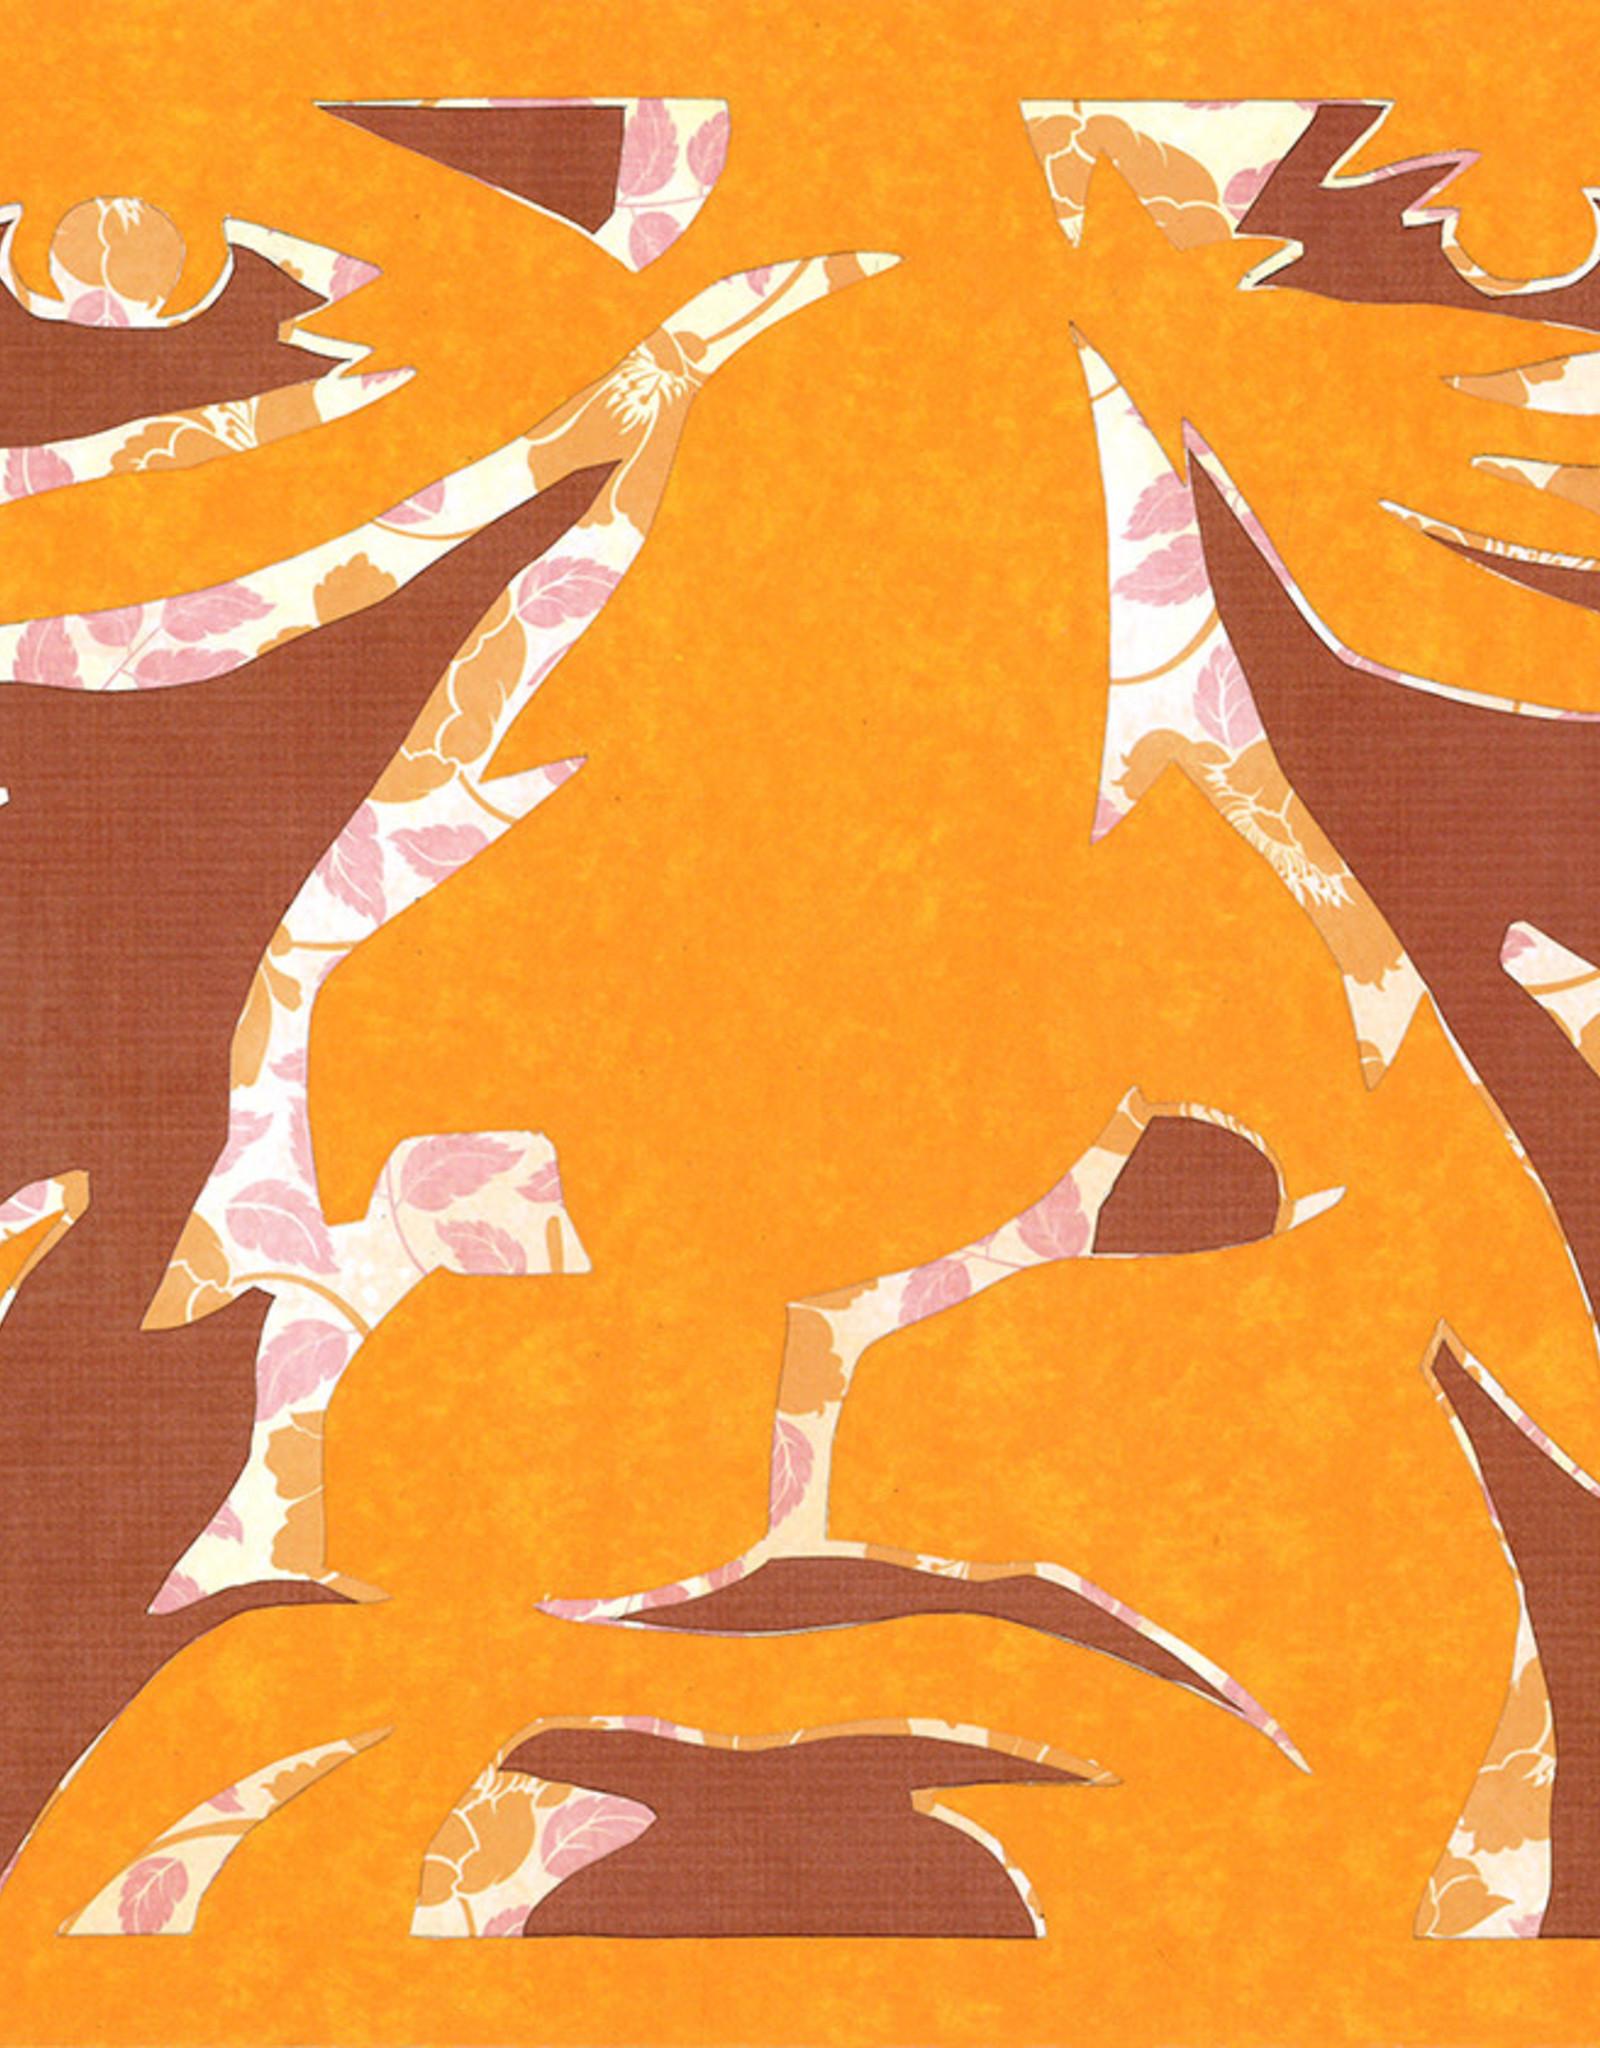 Gray Jones Face to Face -Cutout 9x12 #14